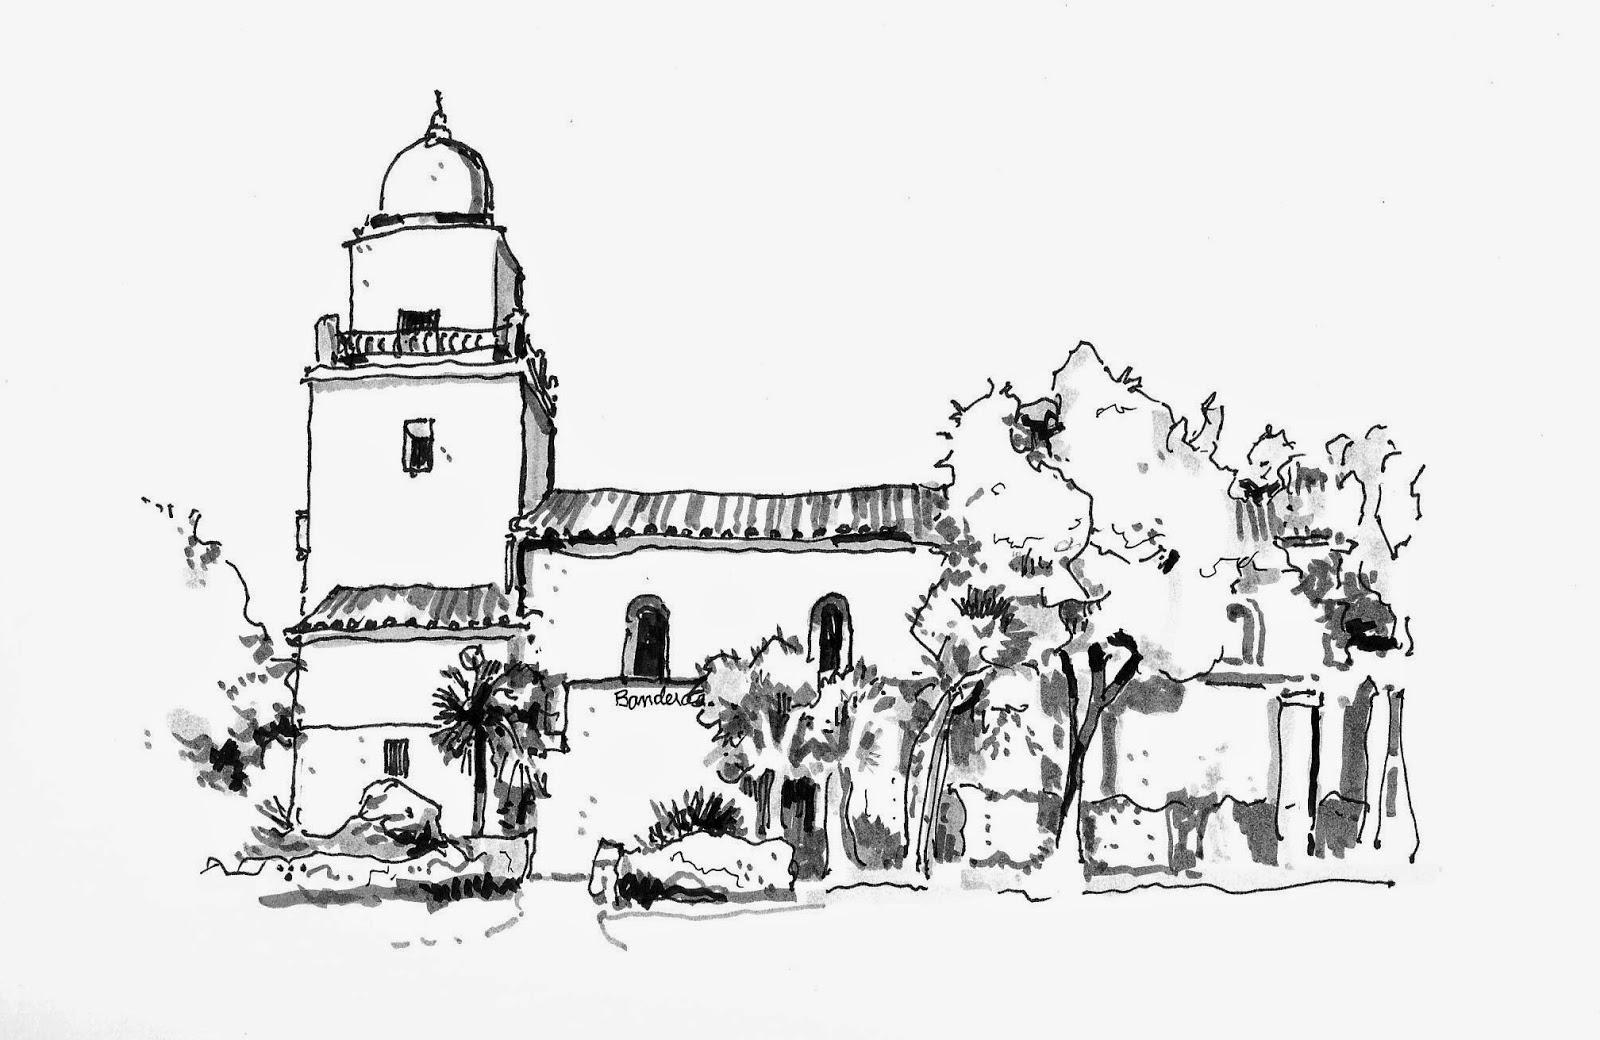 Junipero Serra Drawing - 2018 images & pictures - Saint Junipero ...